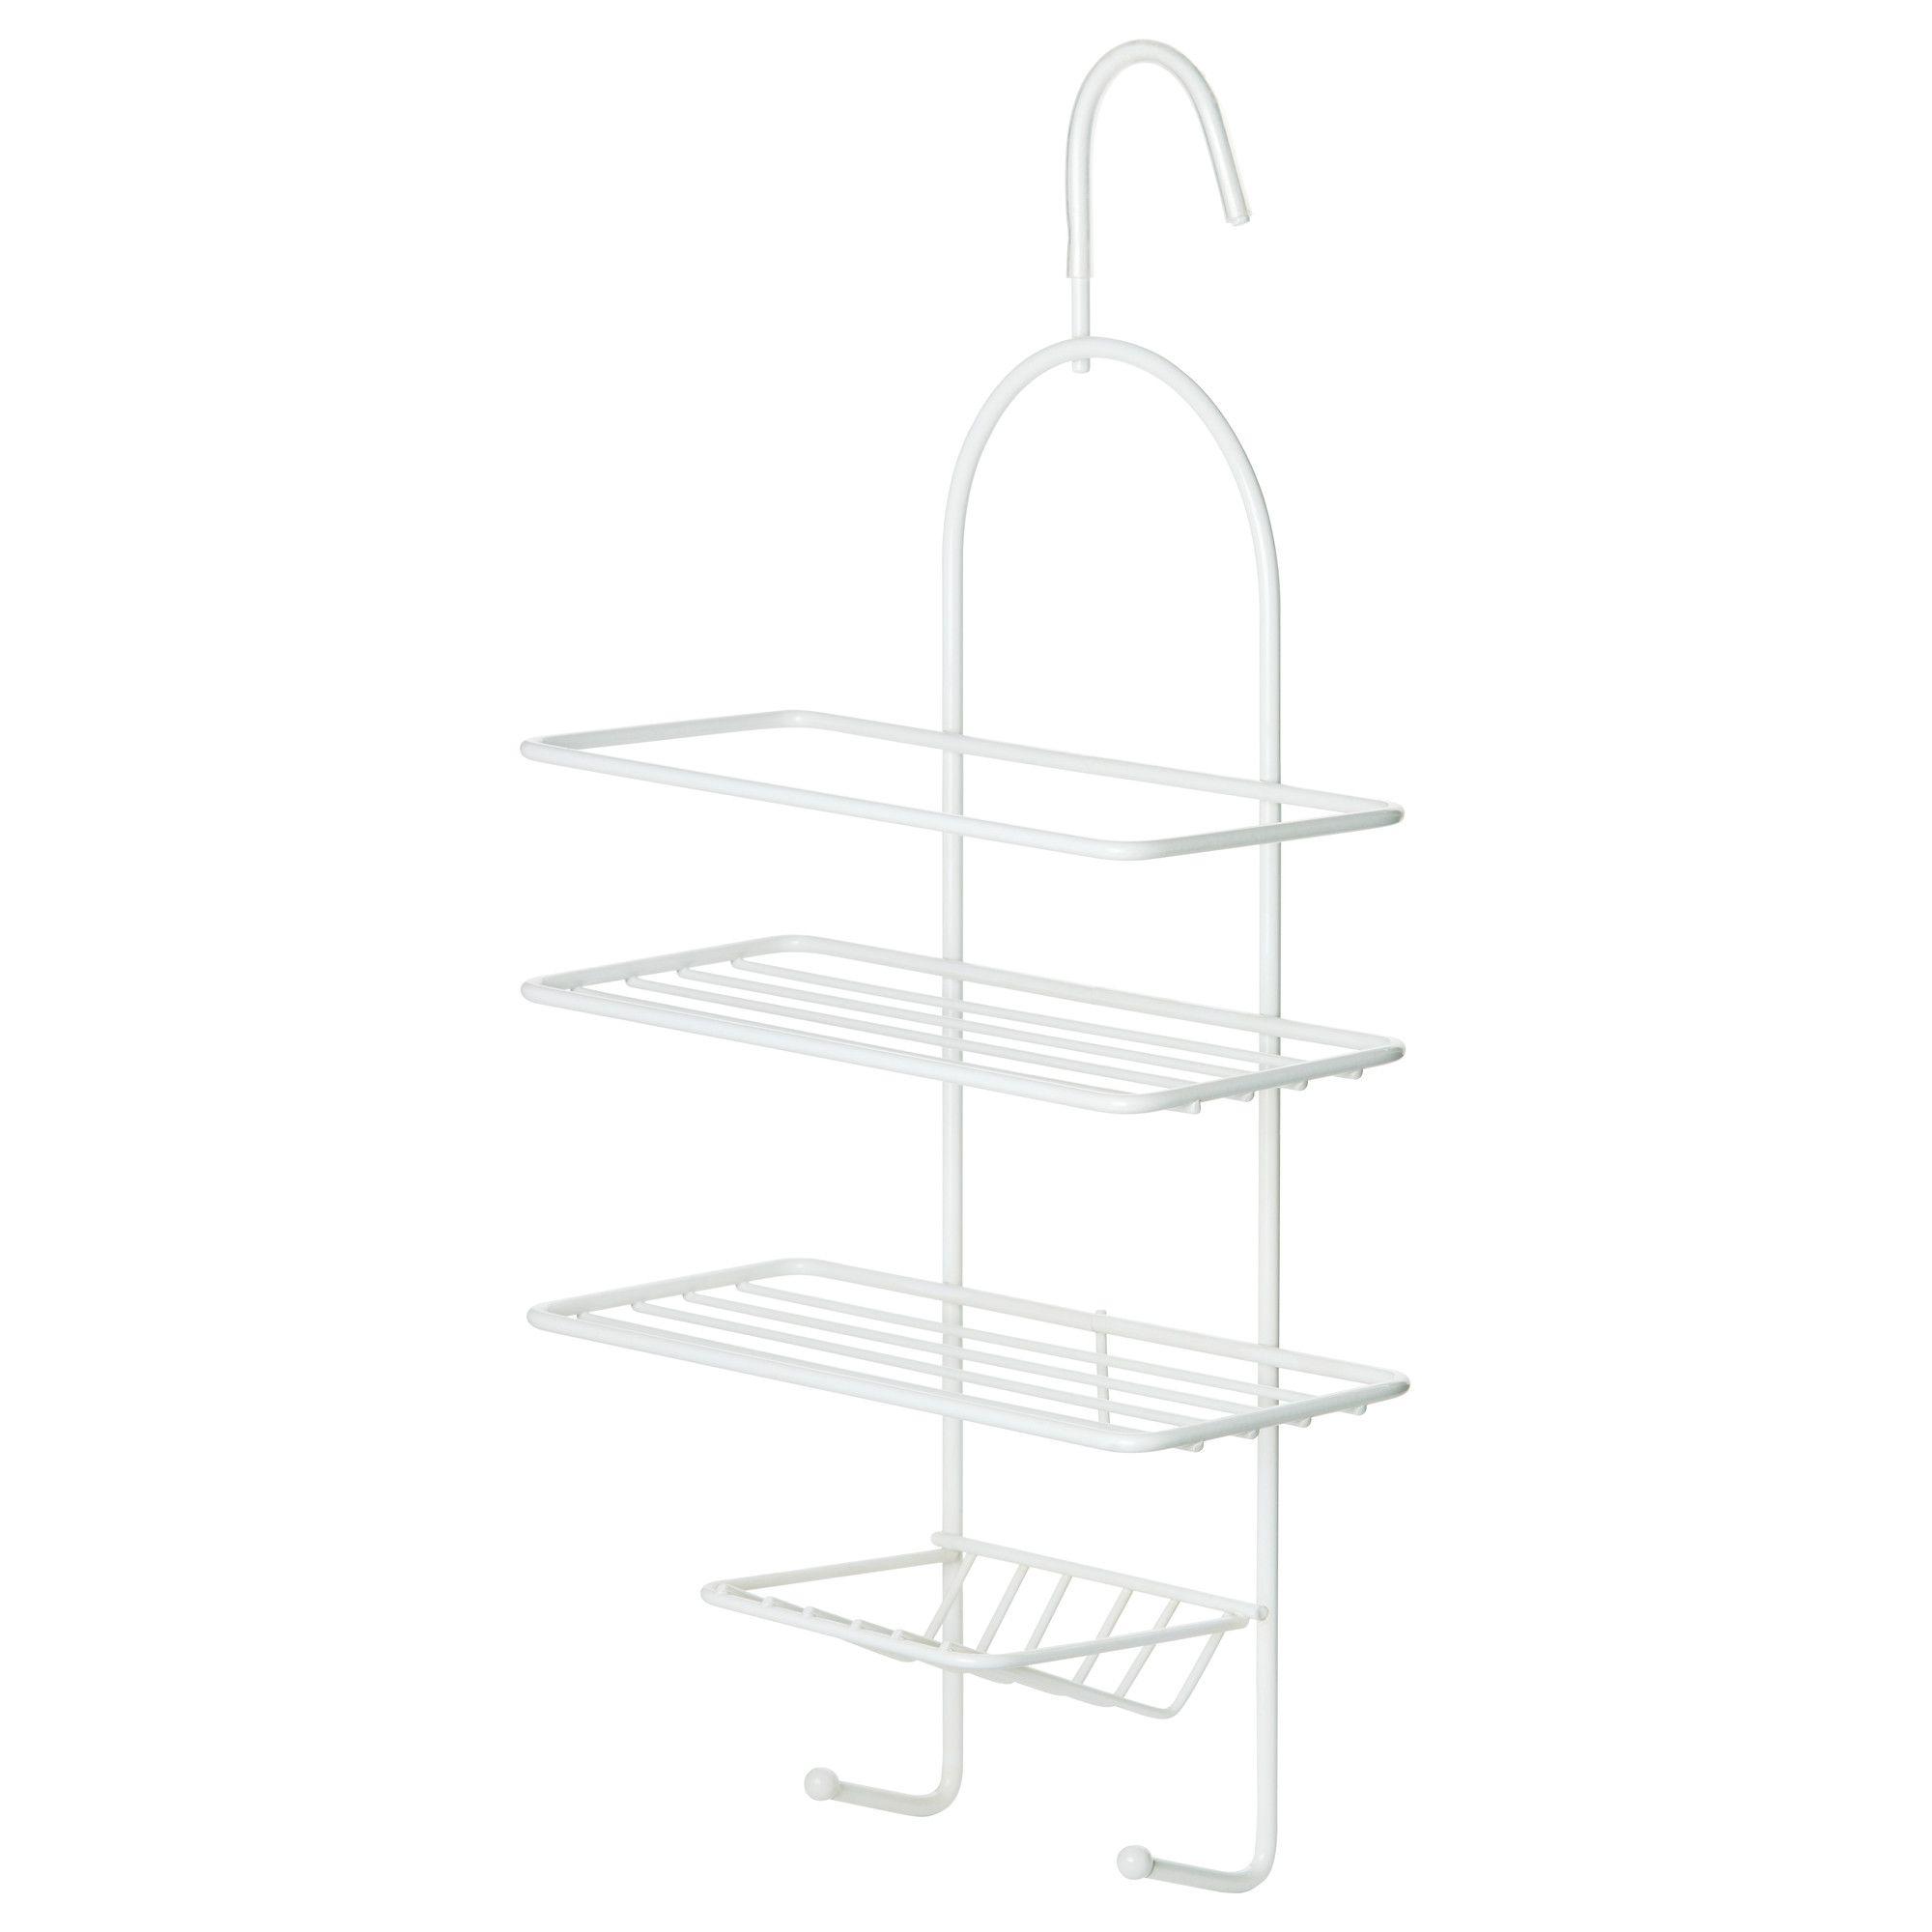 Blanken Shower Caddy White 6 99 Apt Pinterest Flats